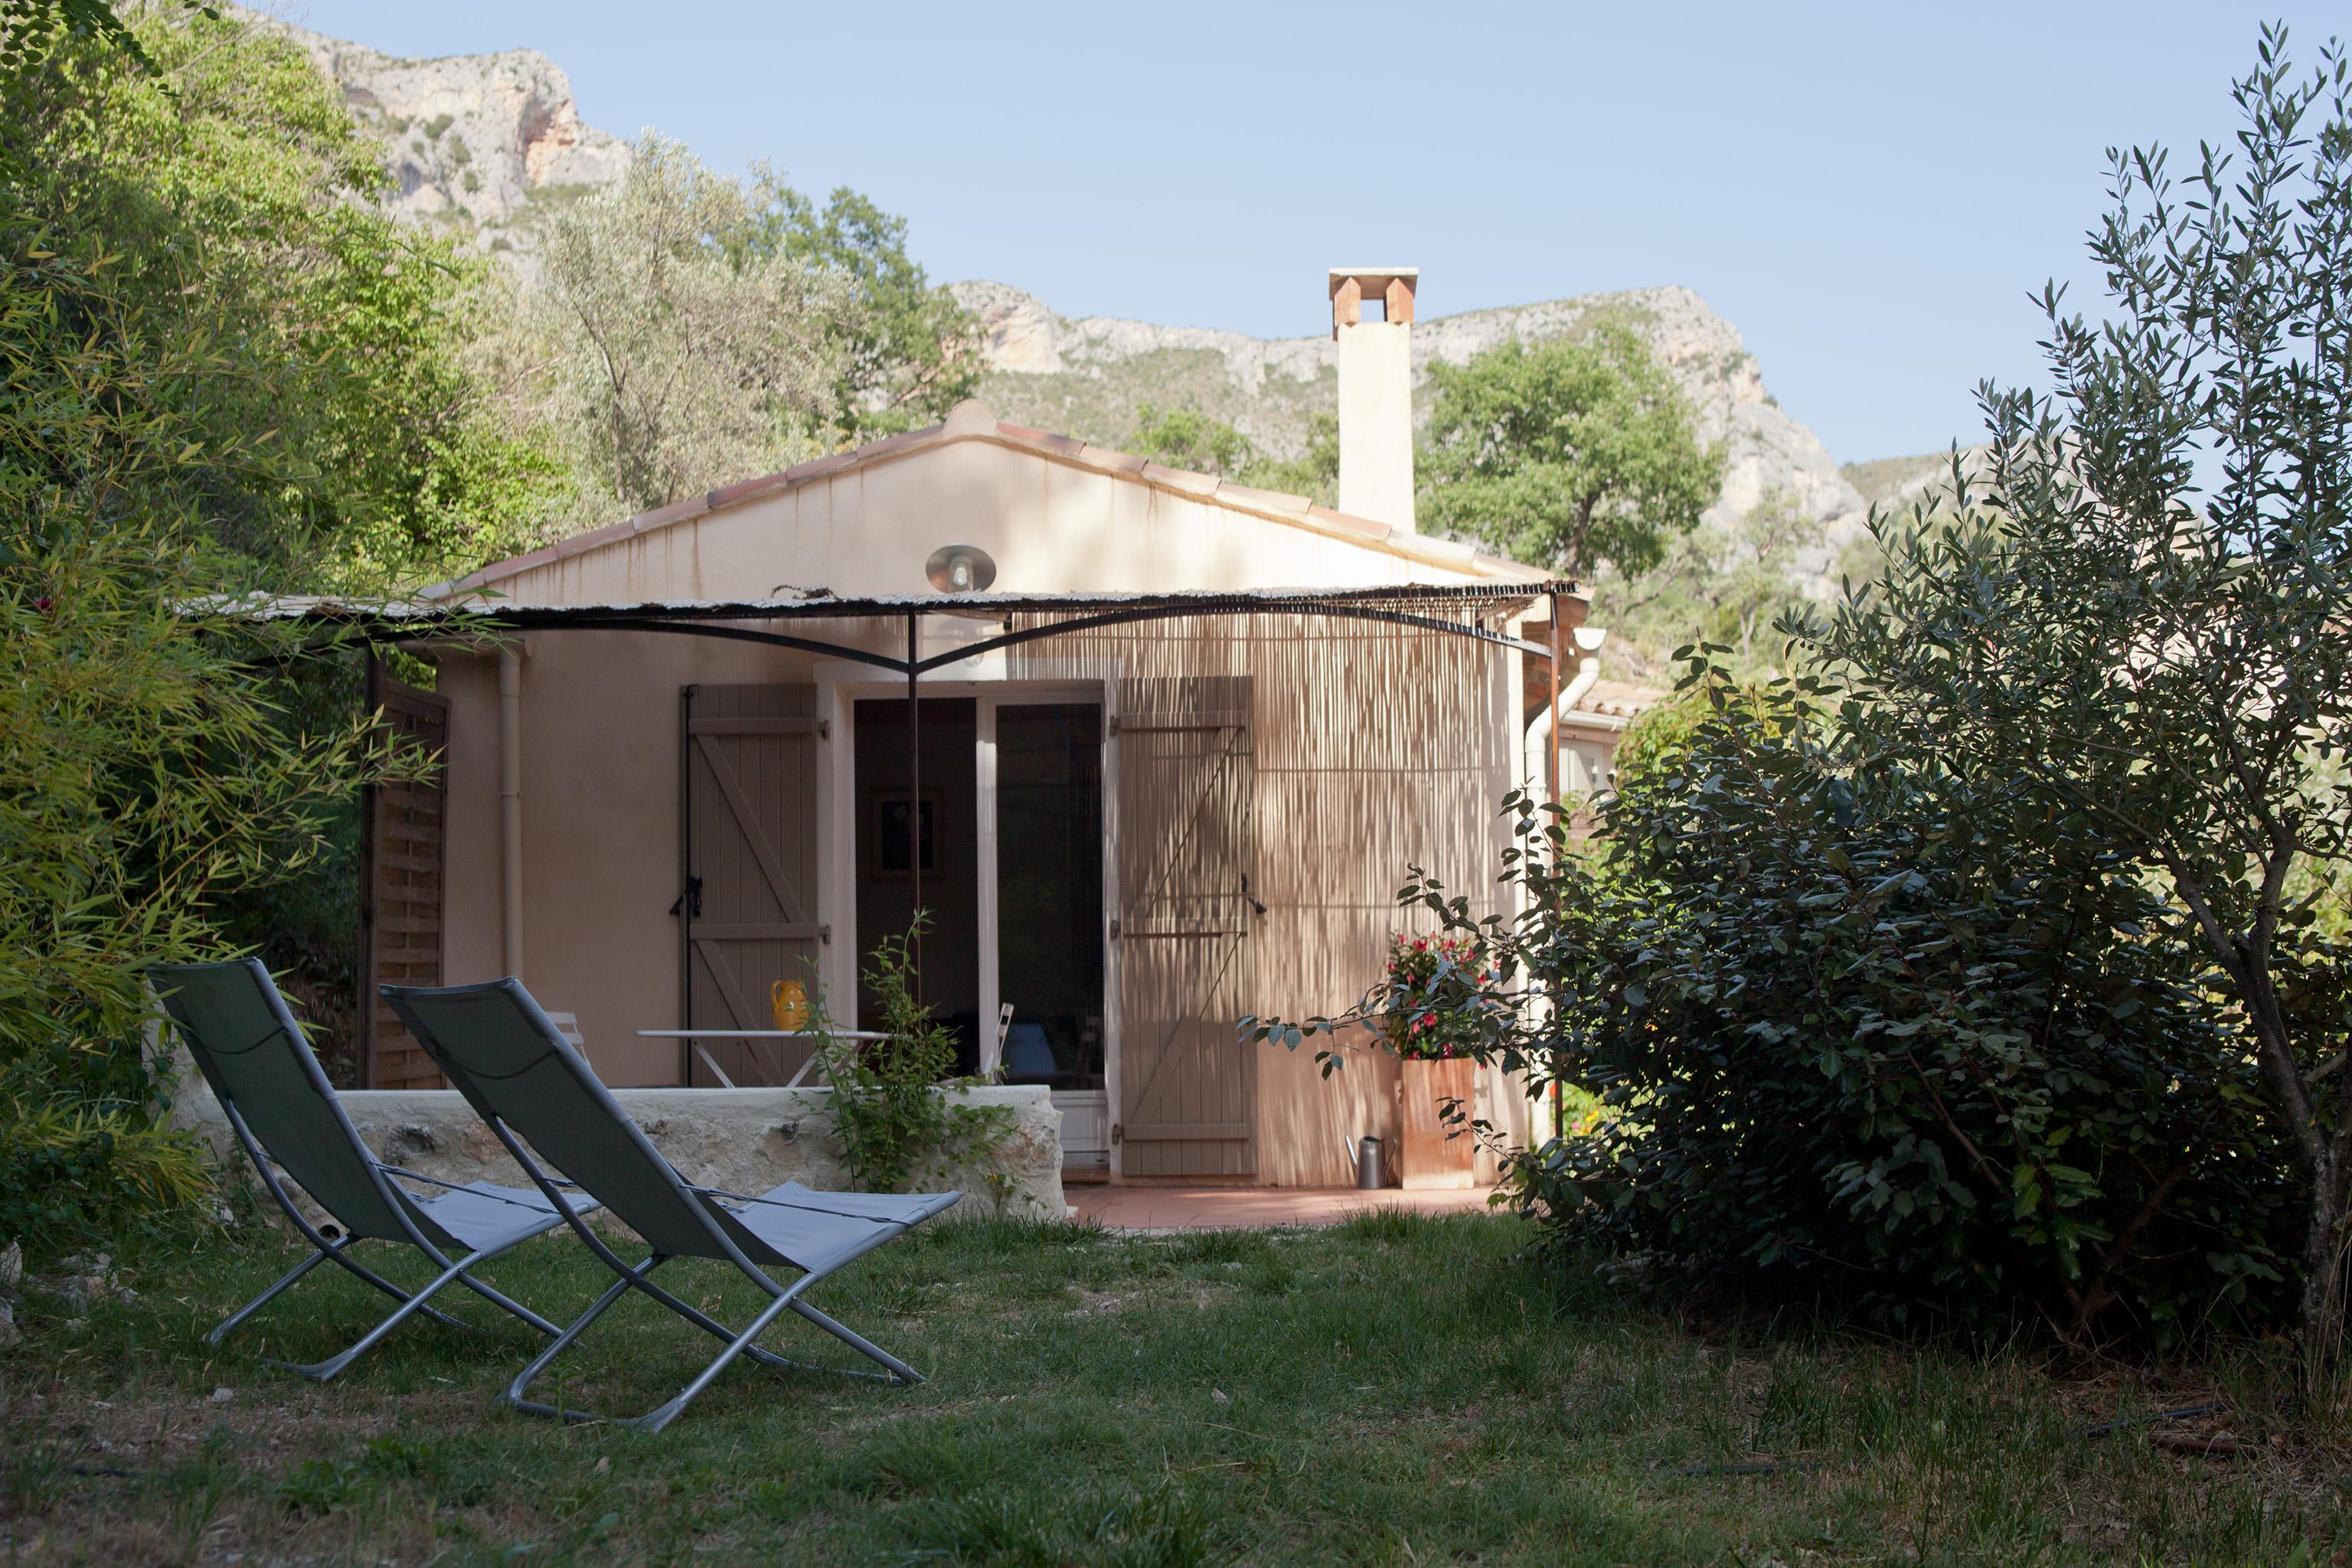 studio chambres d 39 h tes les oliviers chambres d 39 h tes les oliviers. Black Bedroom Furniture Sets. Home Design Ideas